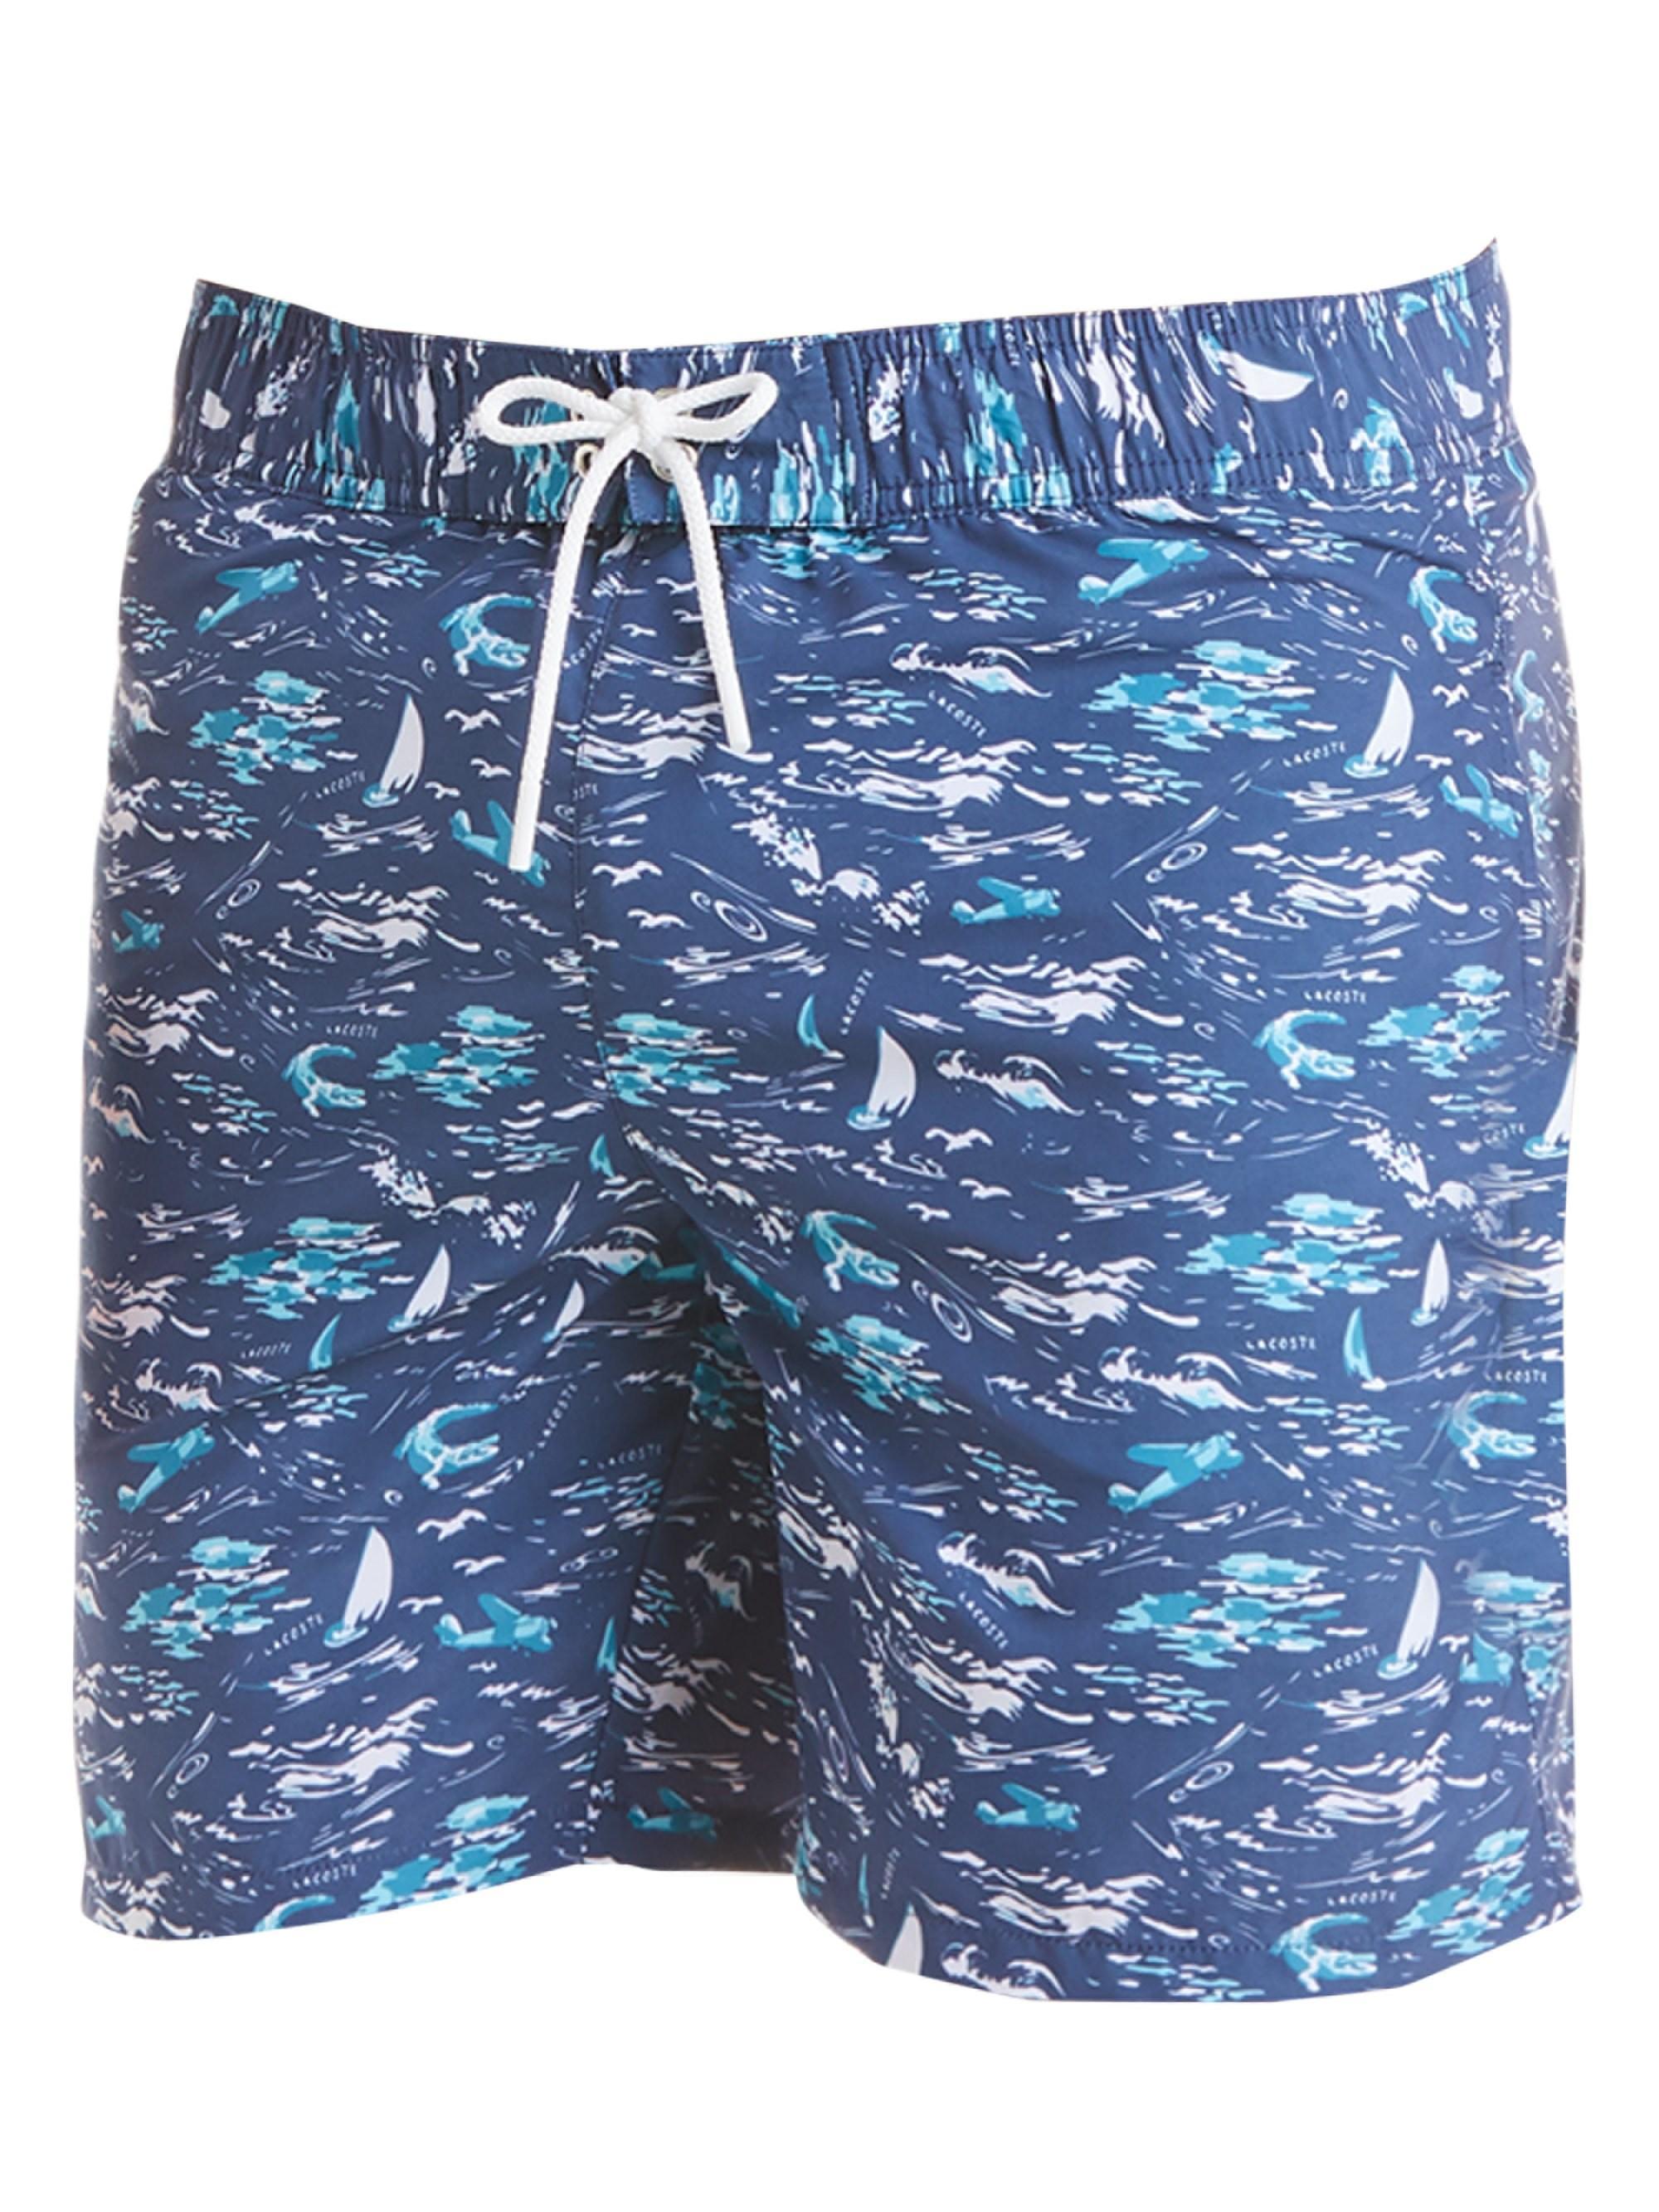 91546313ee2 Lyst - Lacoste Men's Printed Swim Trunks - Navy - Size Xl in Blue ...